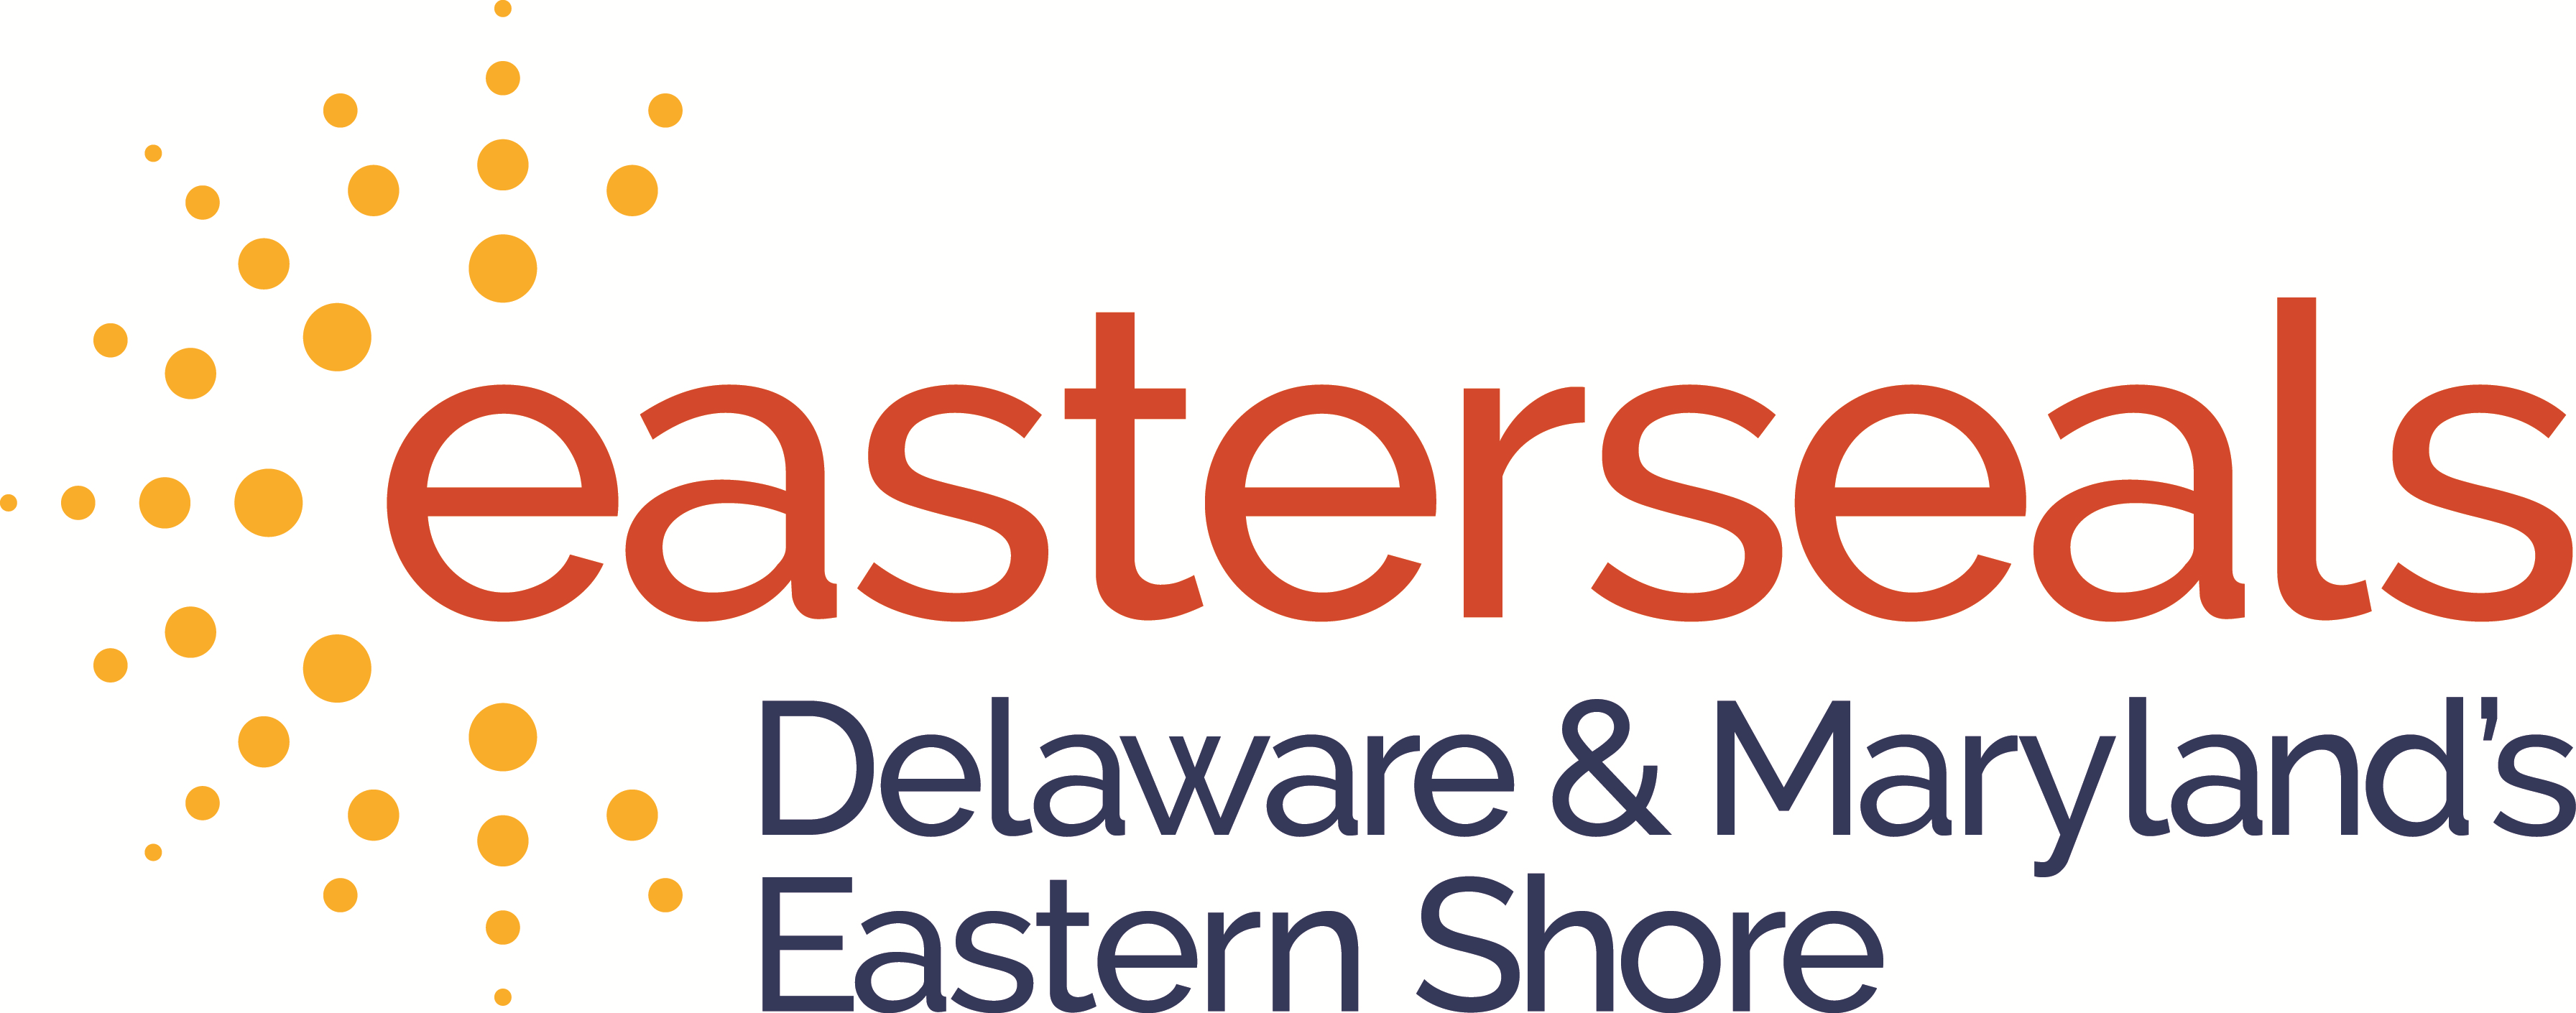 Easterseals Delaware & Maryland's Eastern Shore logo